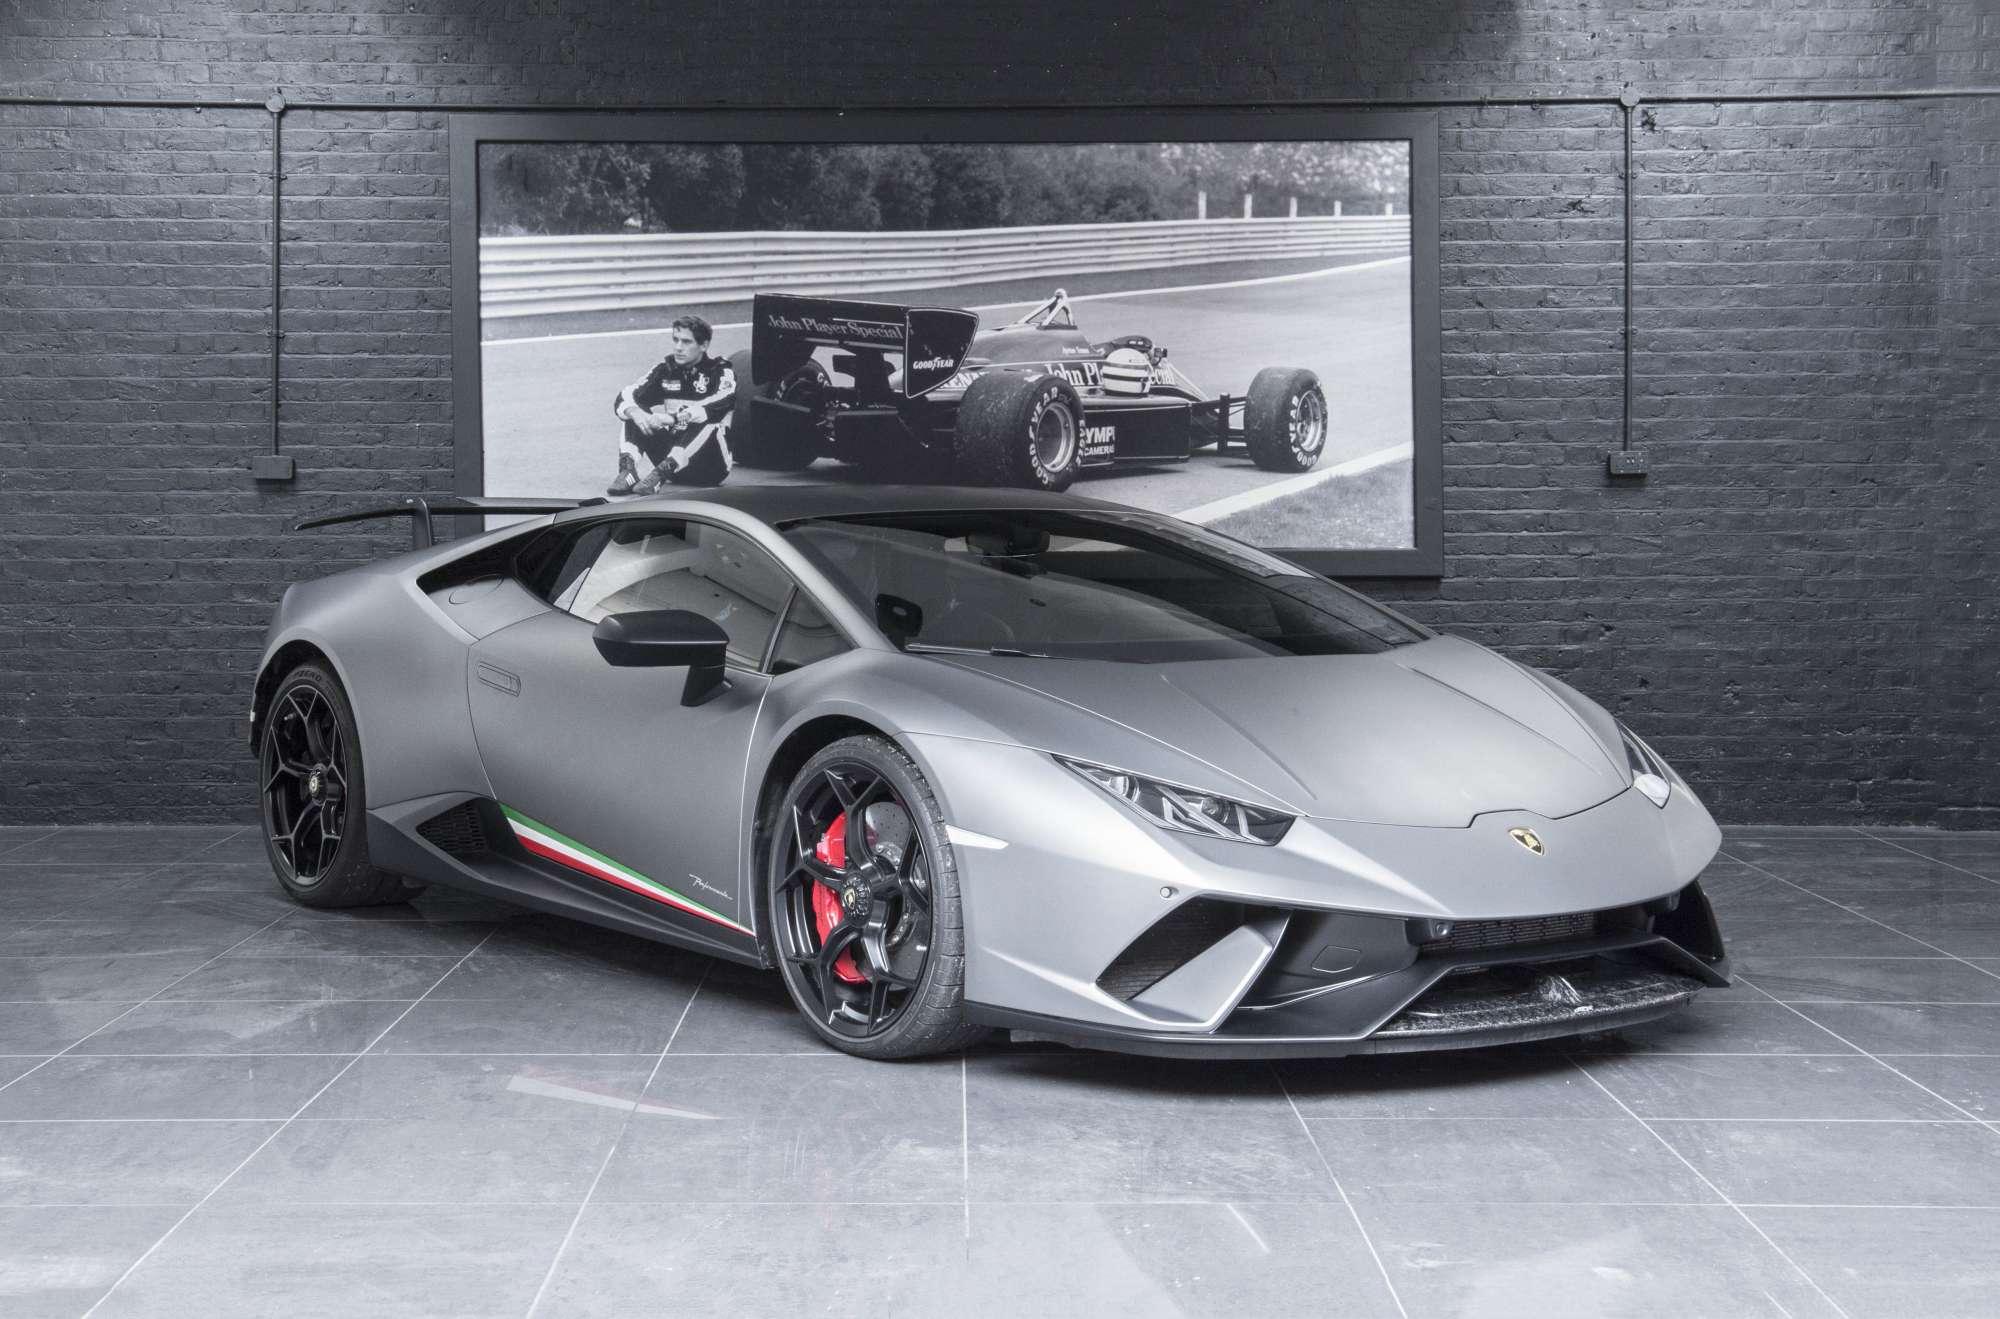 Lamborghini Aventador Black Price >> LHD Lamborghini Huracan Performante - Pegasus Auto House